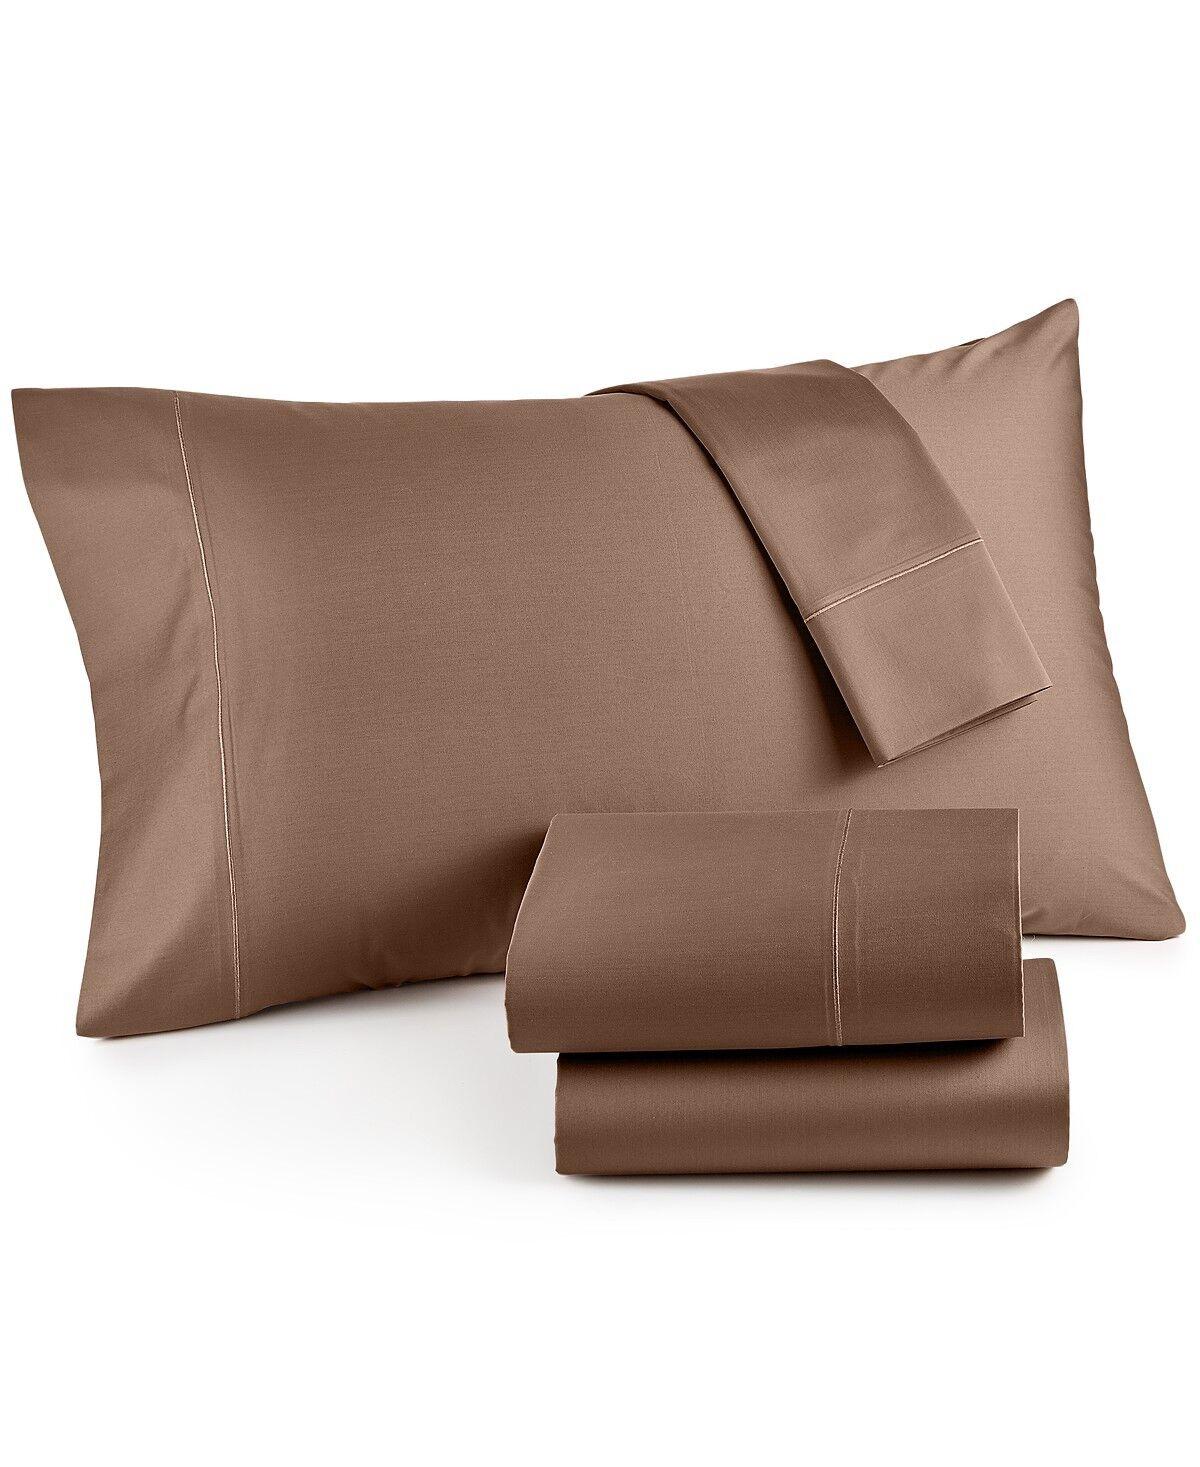 Hotel Collection 525 TC Cotton QUEEN EXTRA DEEP Sheet Set Truffle Bedding G625